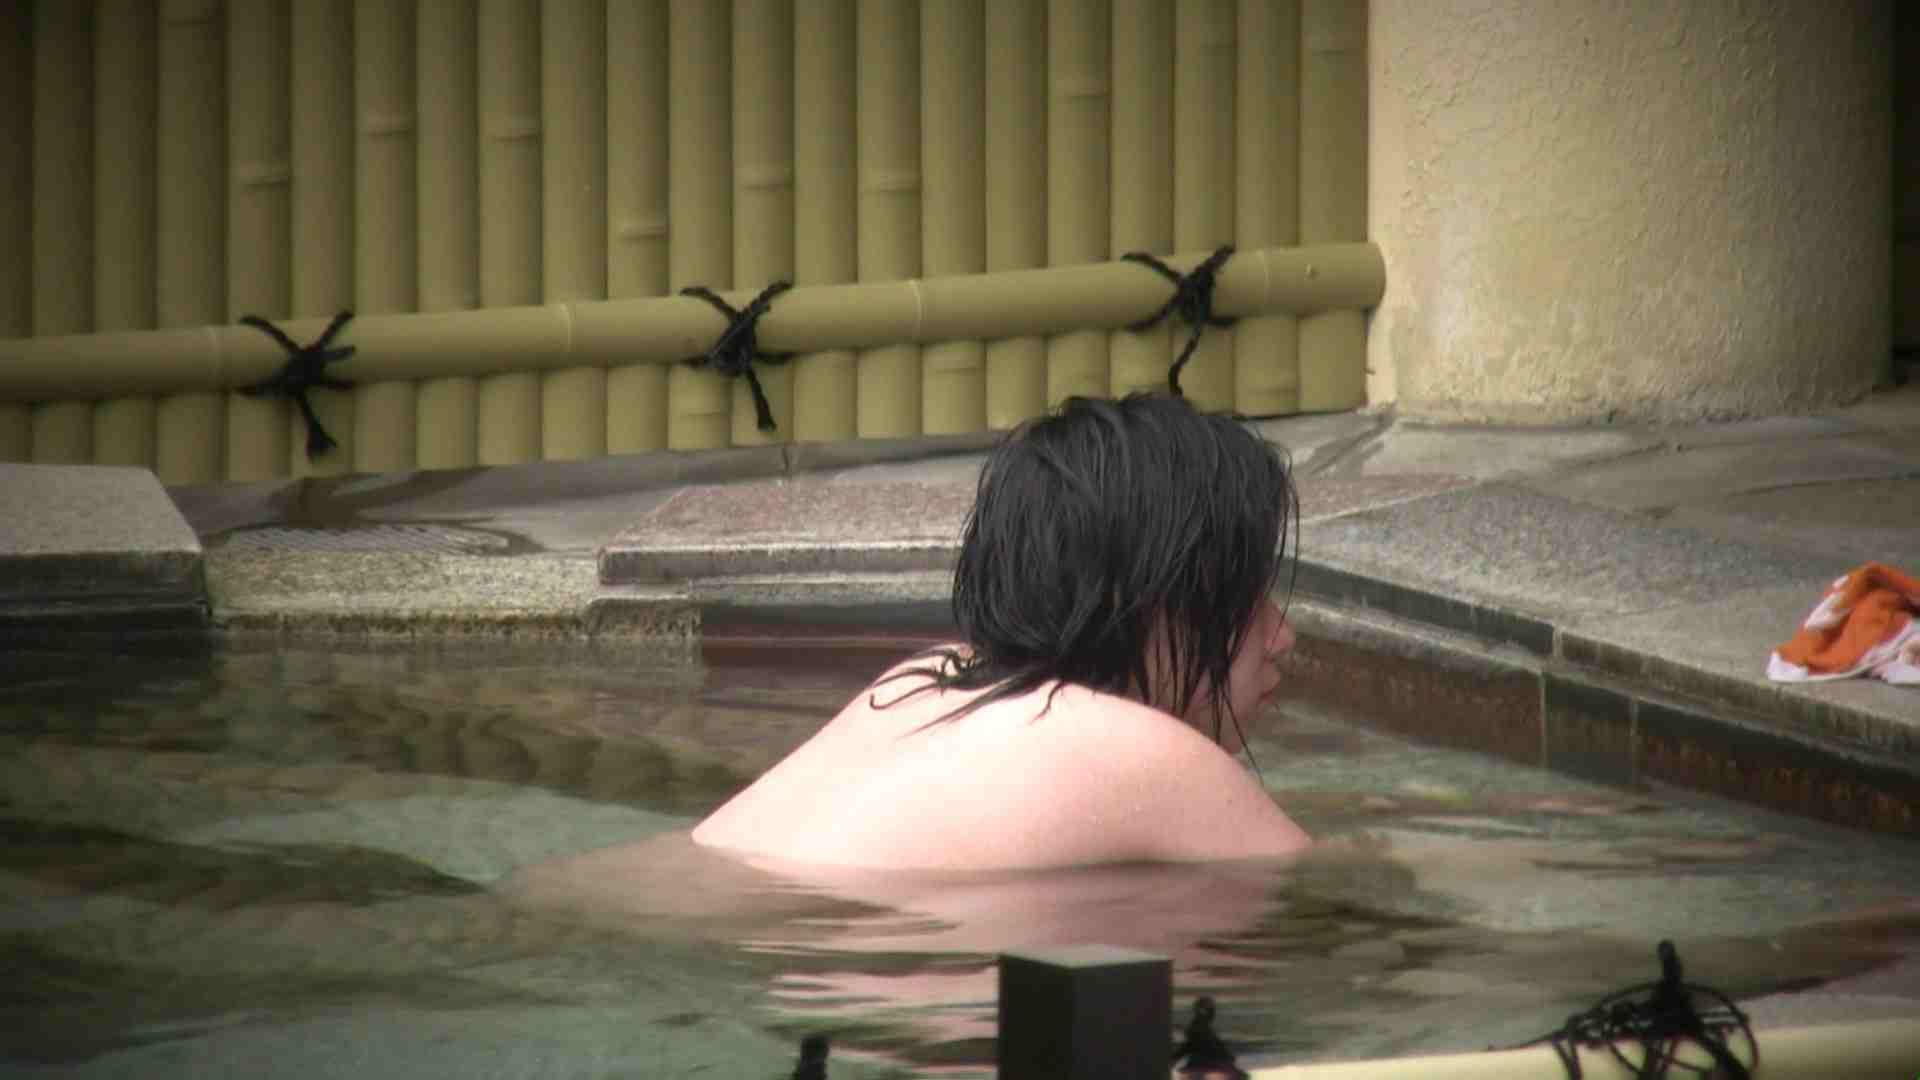 Aquaな露天風呂Vol.36 盗撮 | HなOL  68pic 12